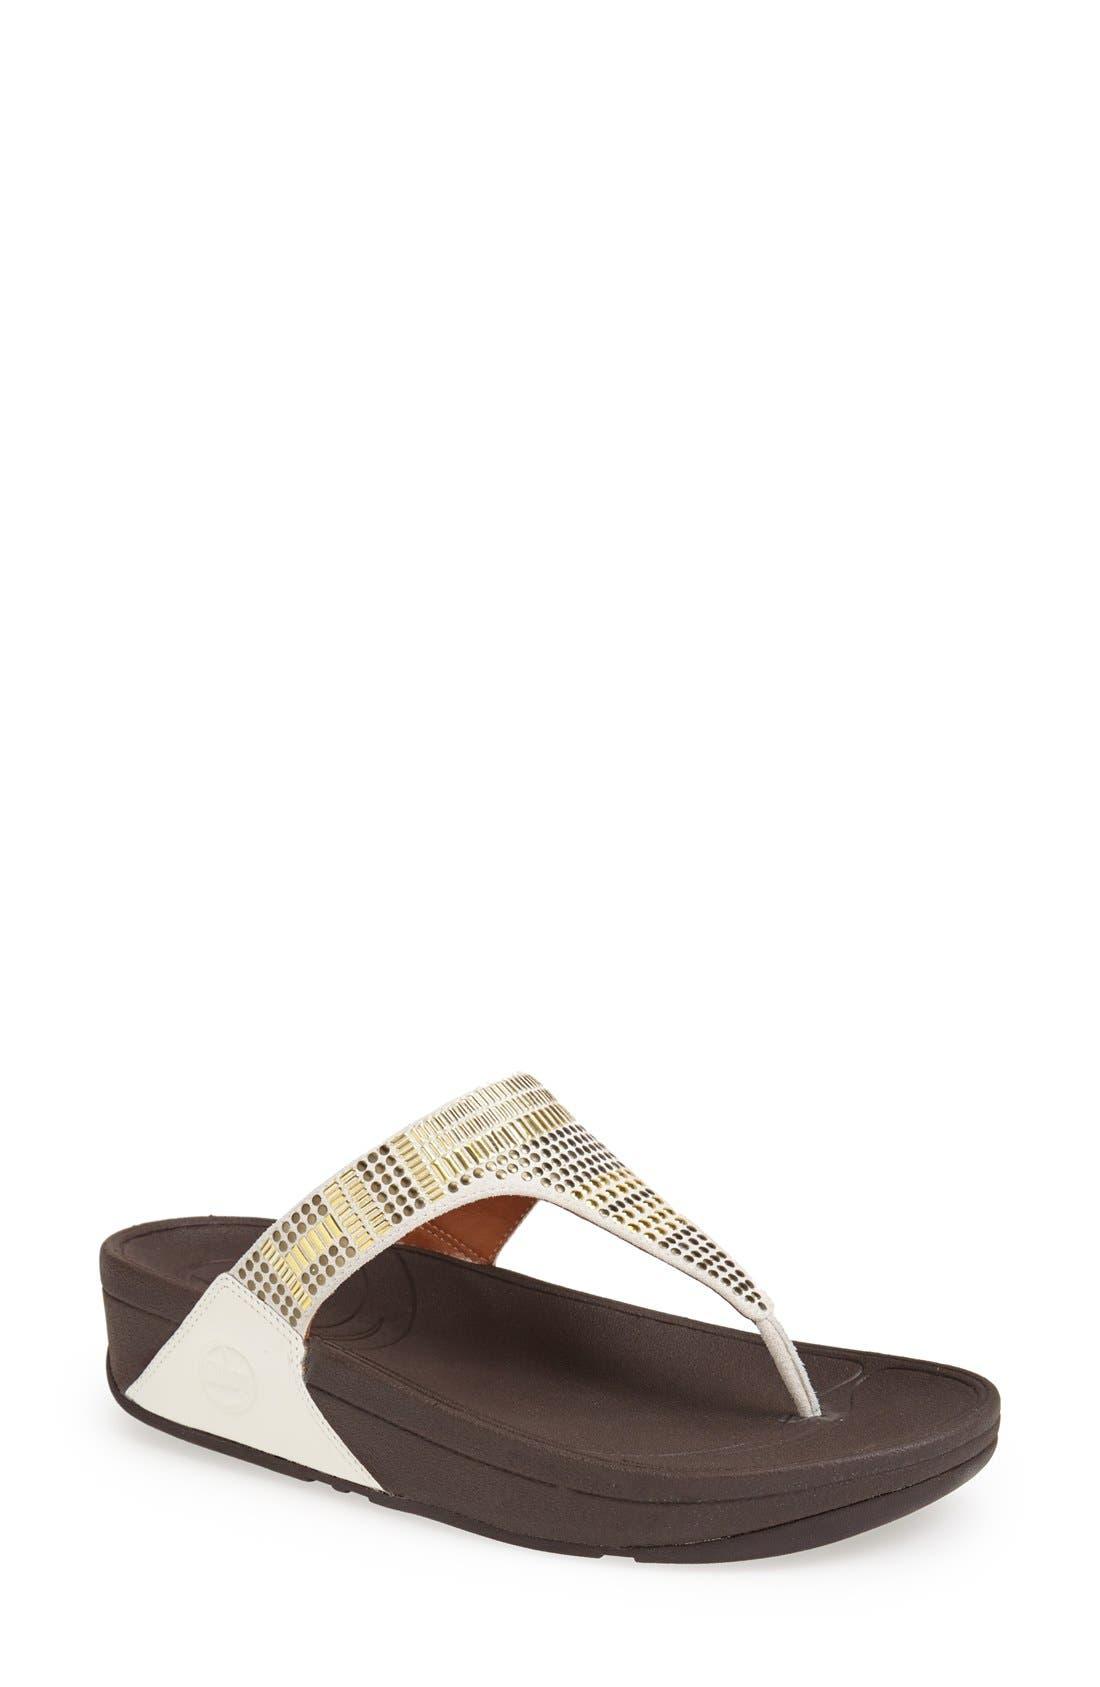 Main Image - FitFlop 'Aztek Chada' Sandal